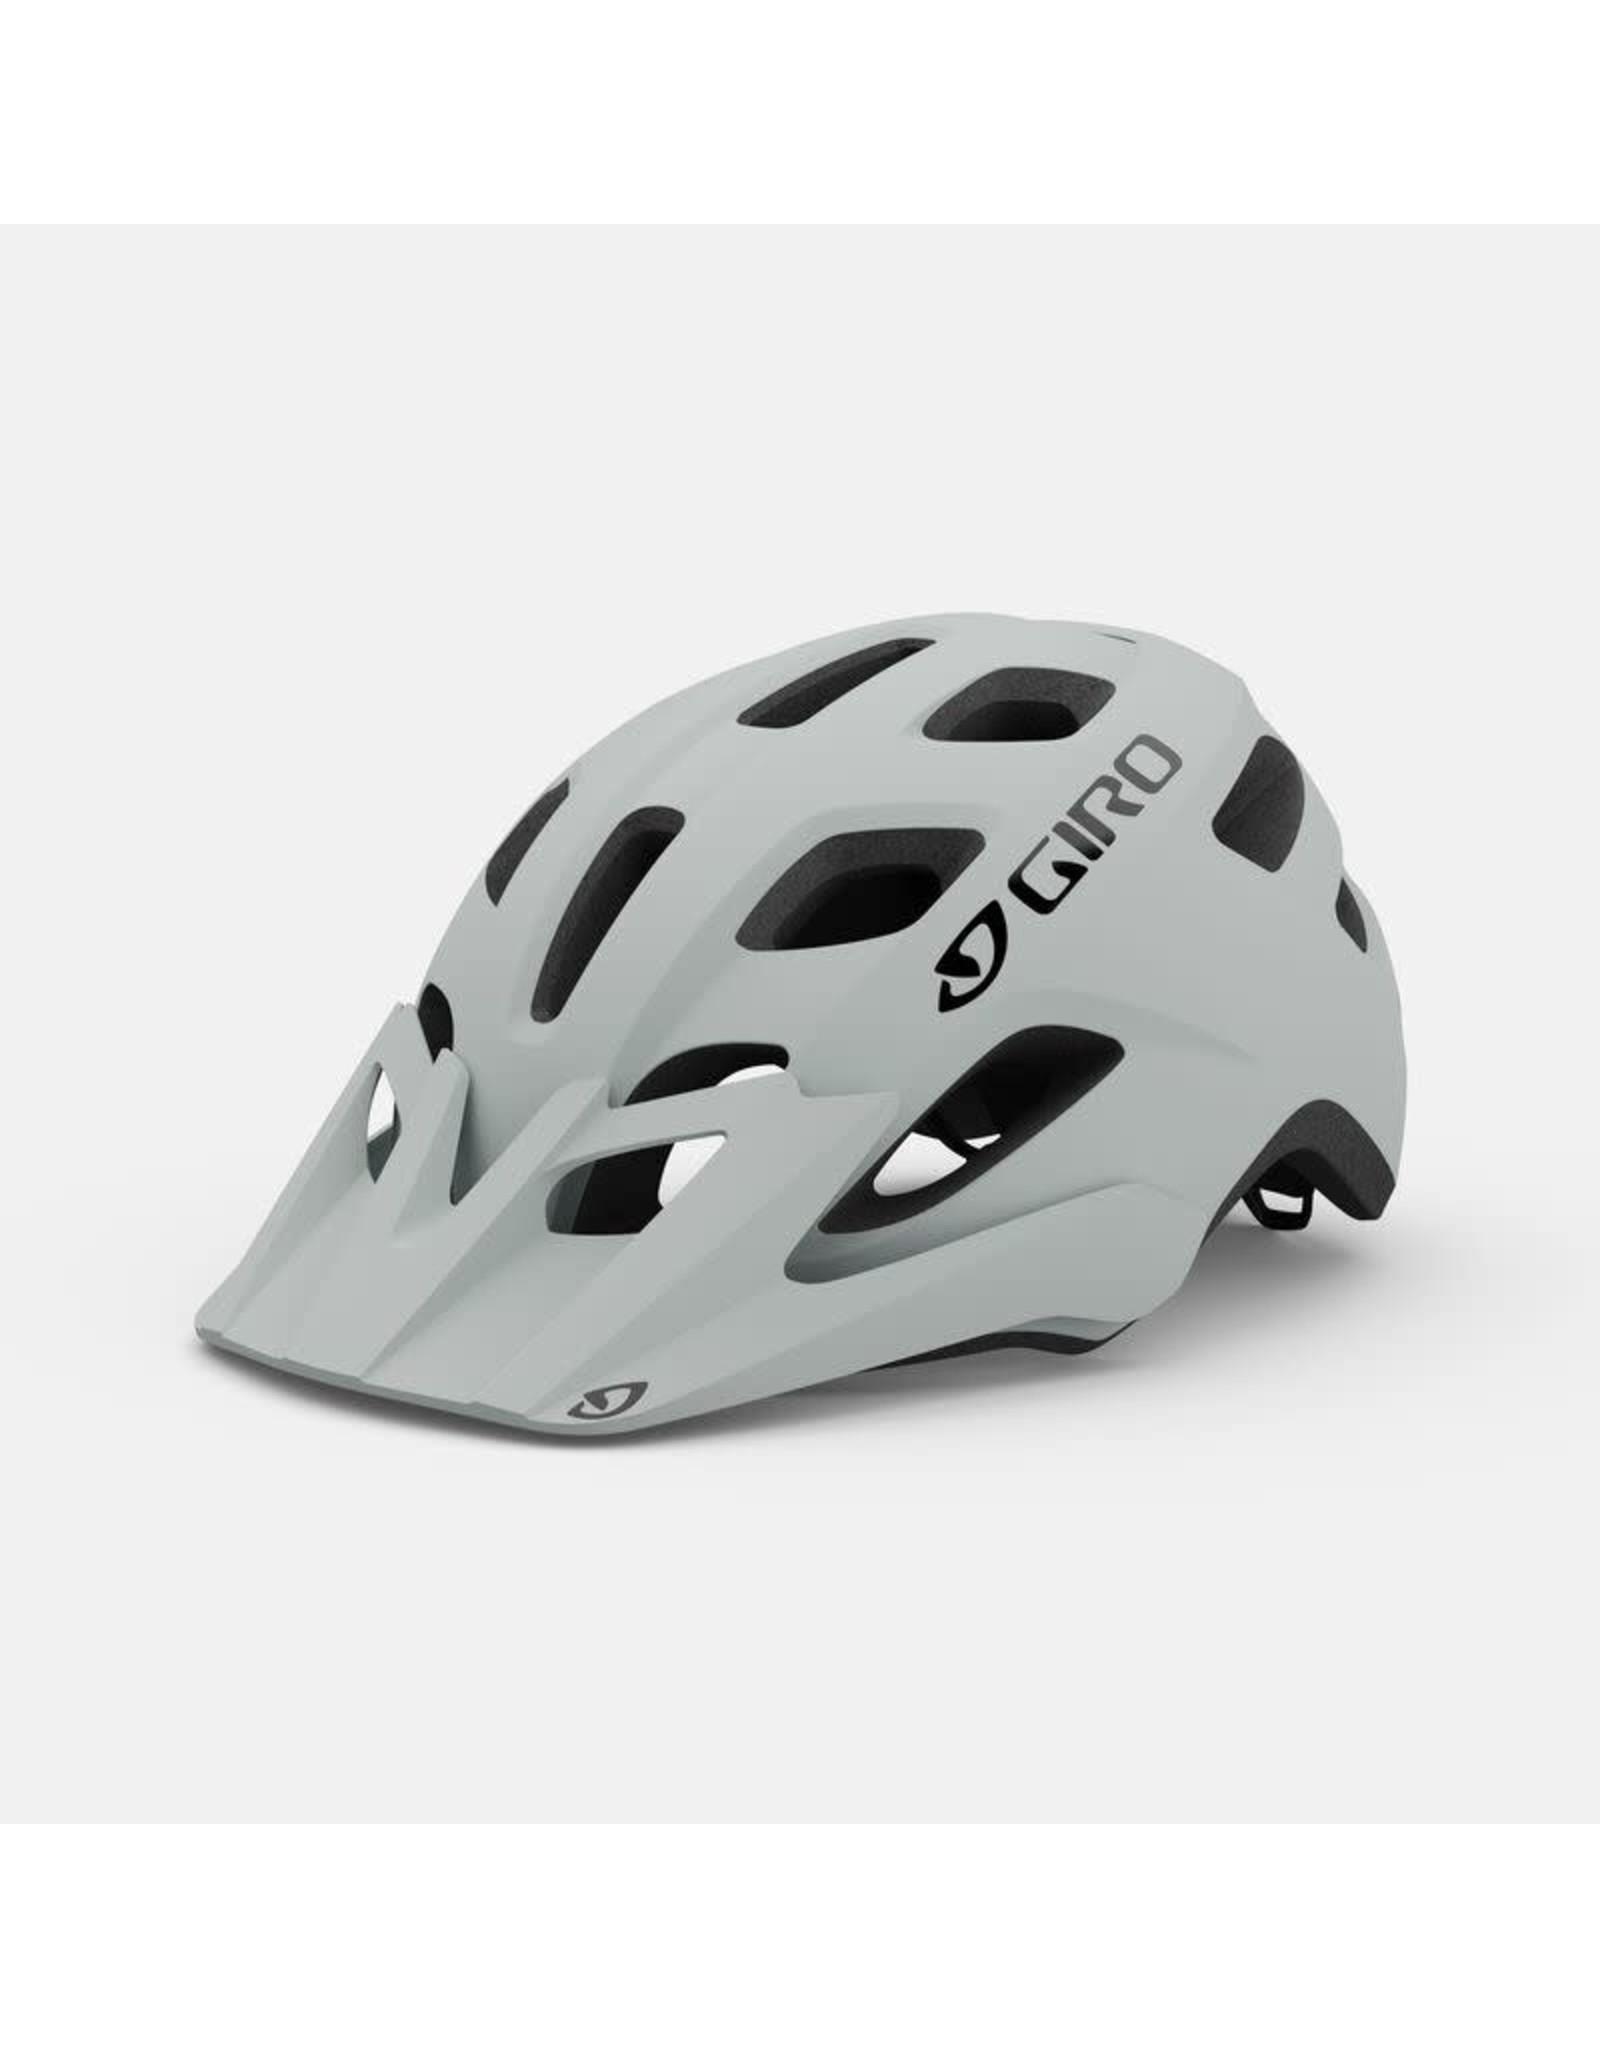 Giro Cycling Giro Fixture MIPS Universal Fit Helmet